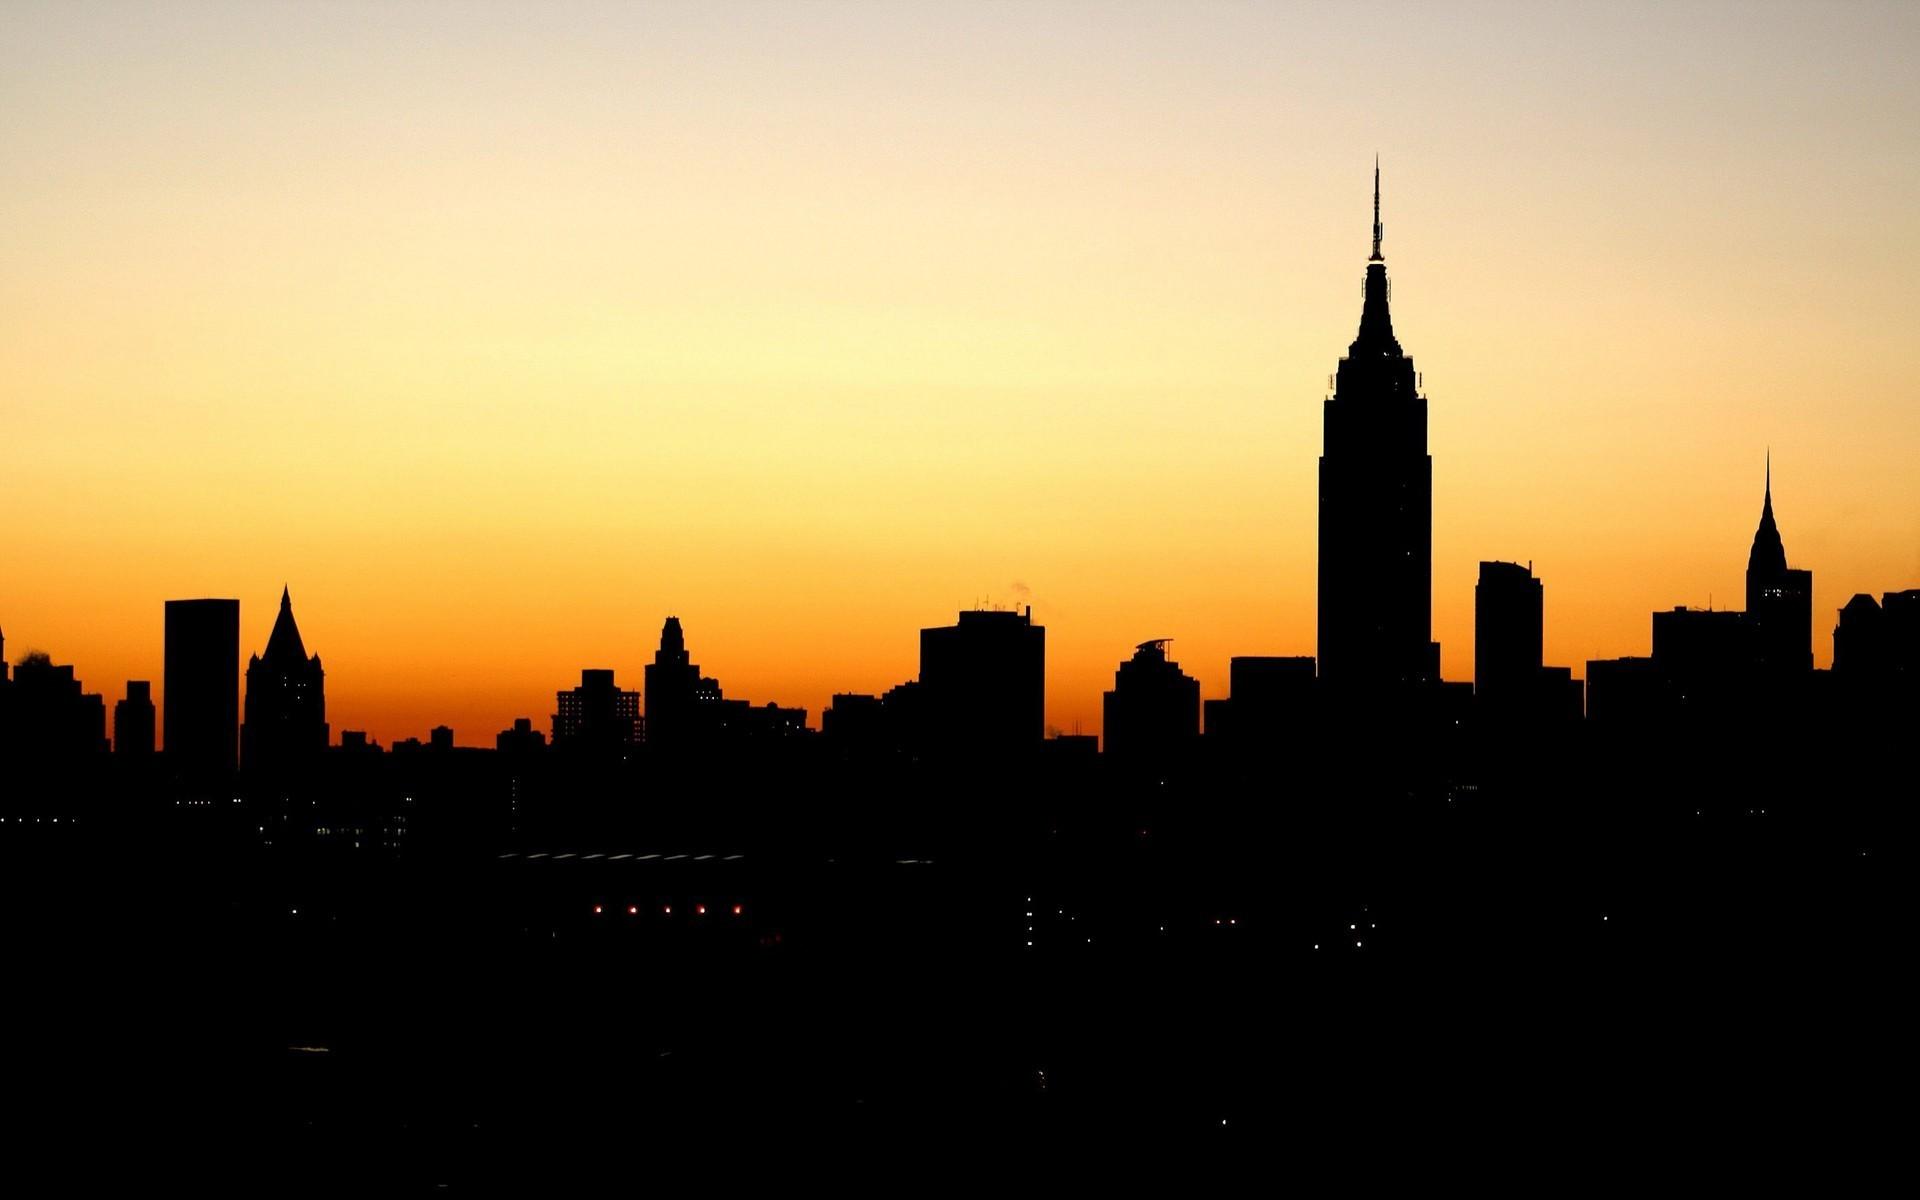 Skyline City Cliparts Co